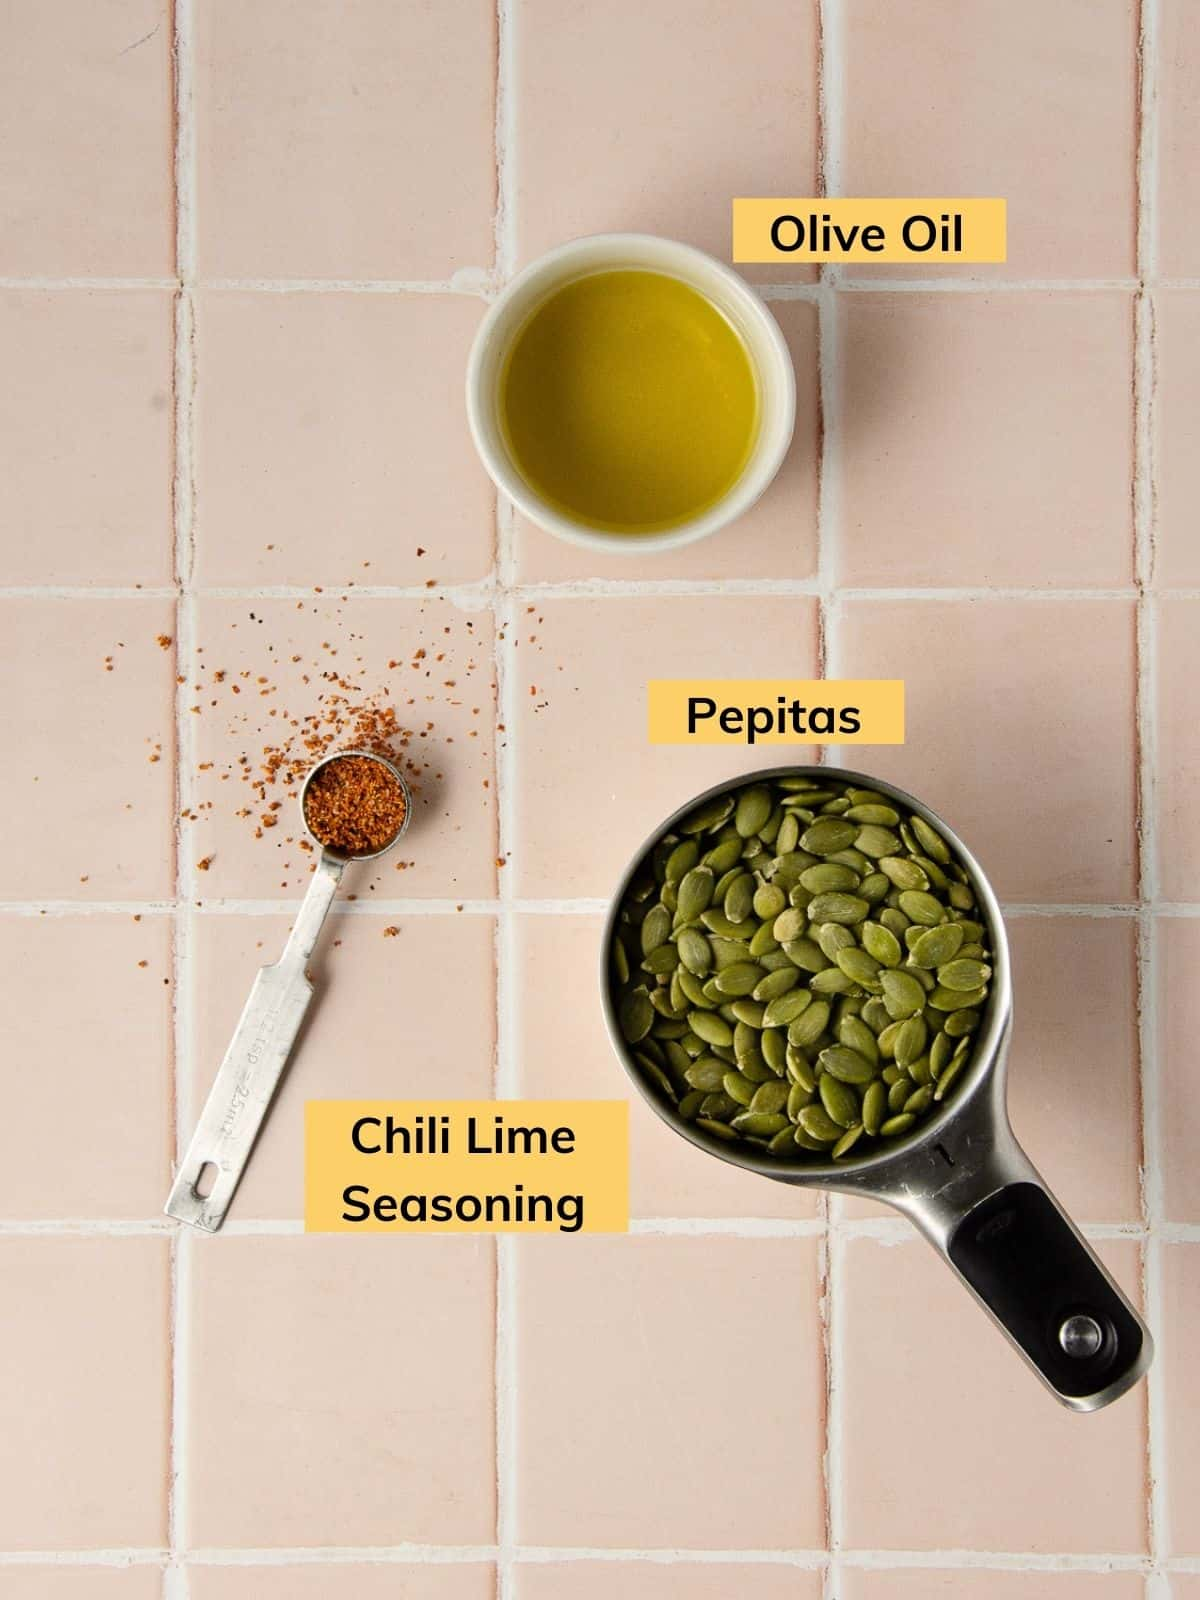 Ingredients for roasting pepitas: pepitas, chili lime seasoning and olive oil